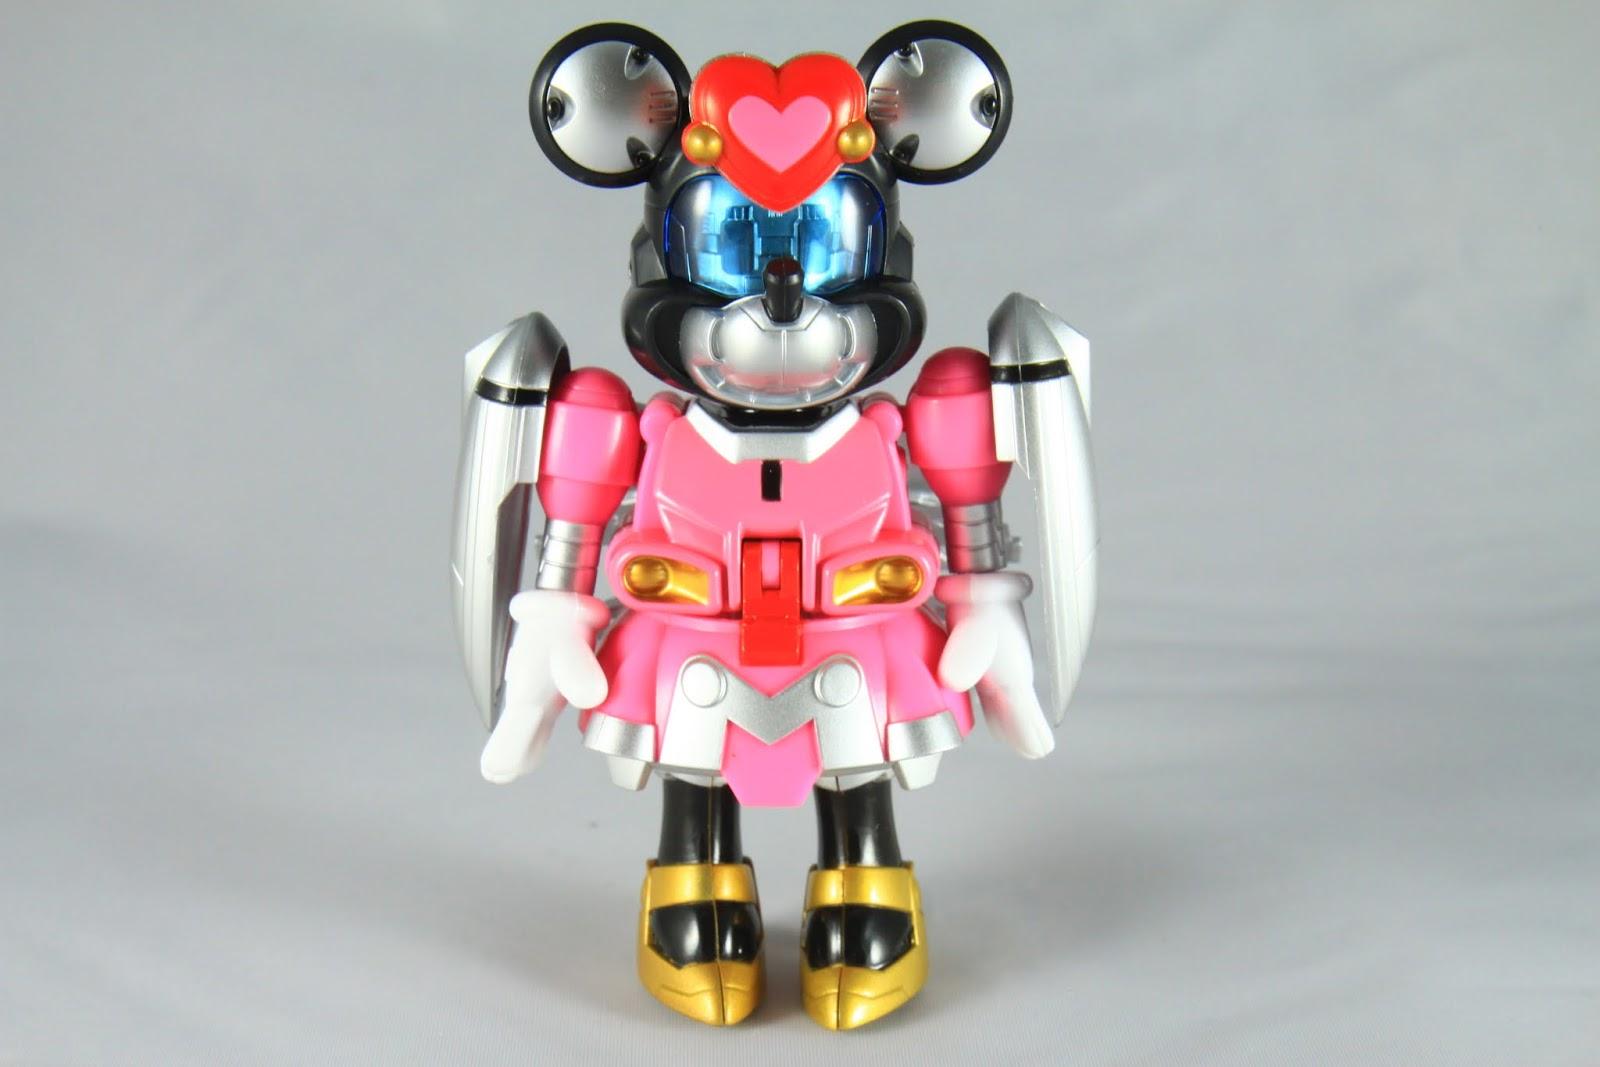 Sky Minnie- 天空米妮 兩隻老鼠都是空中系列的 所以都有翅膀這樣